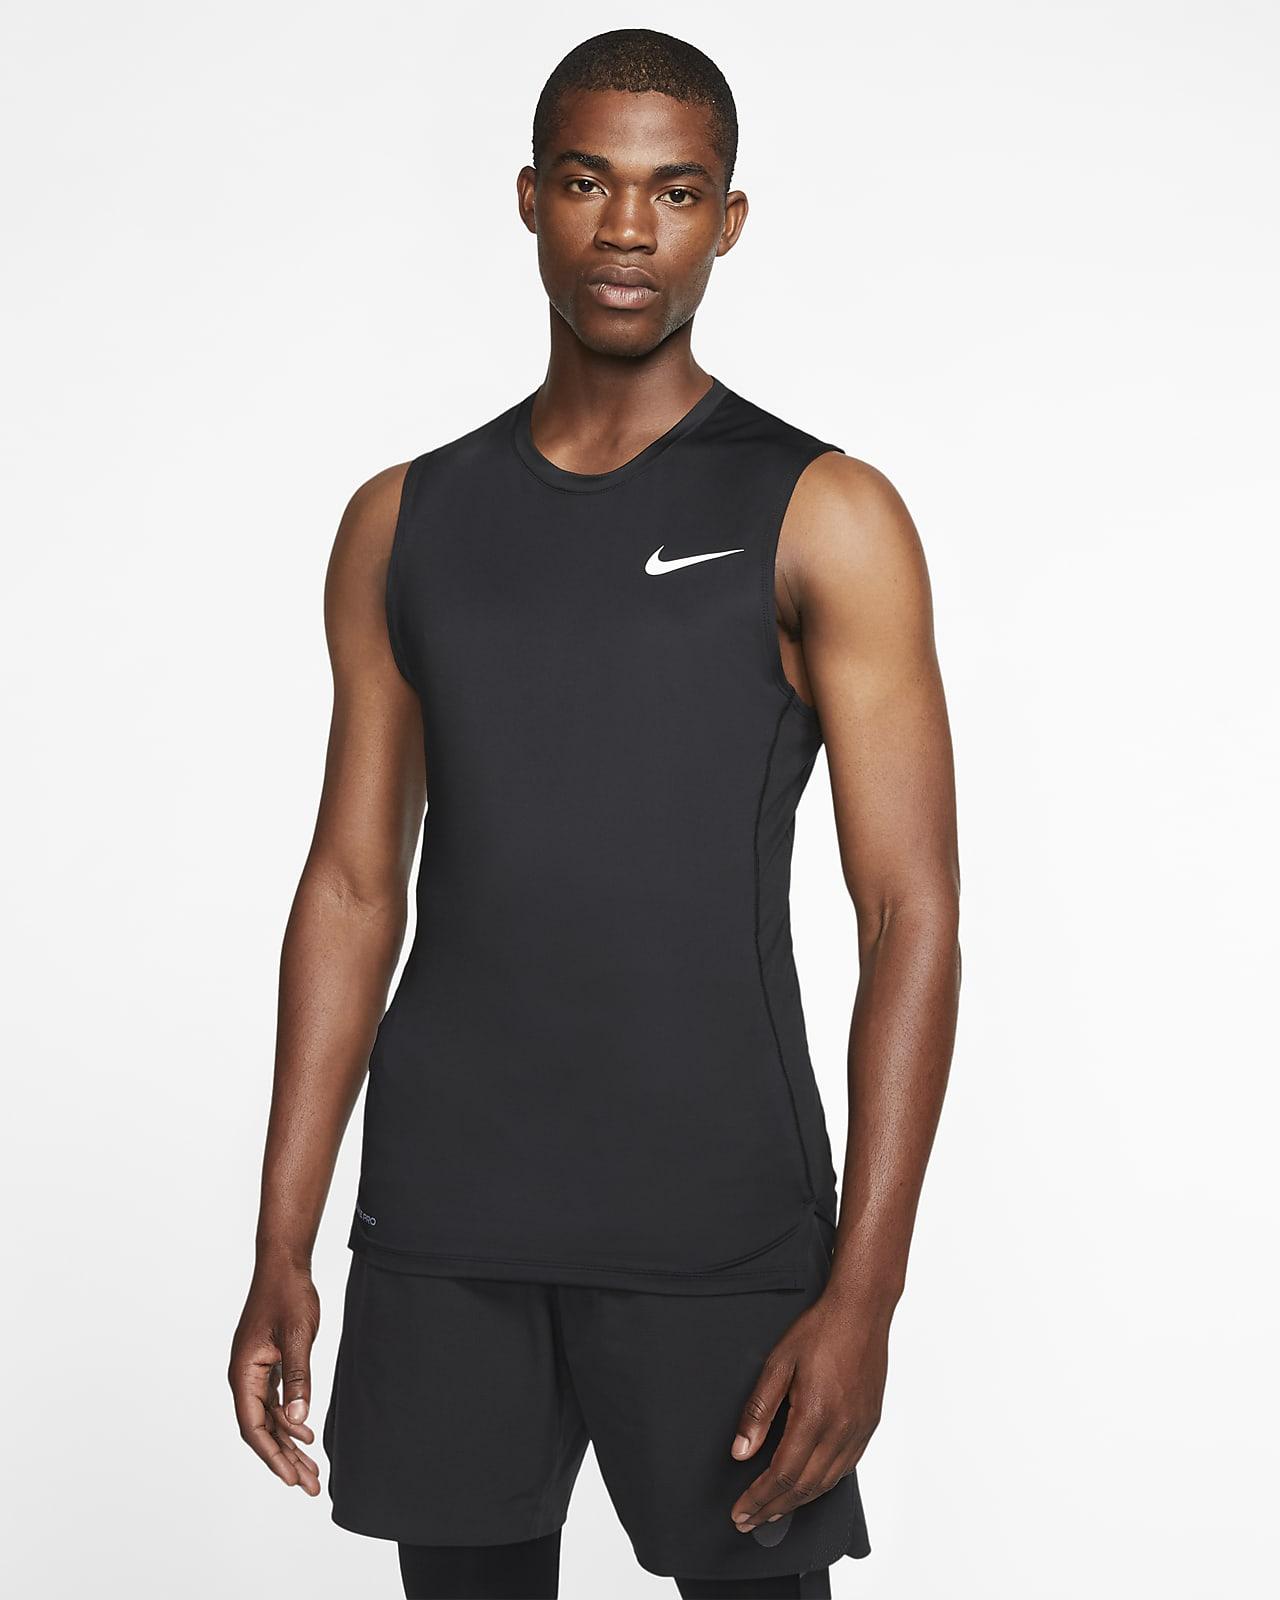 Nike Pro Men's Sleeveless Top